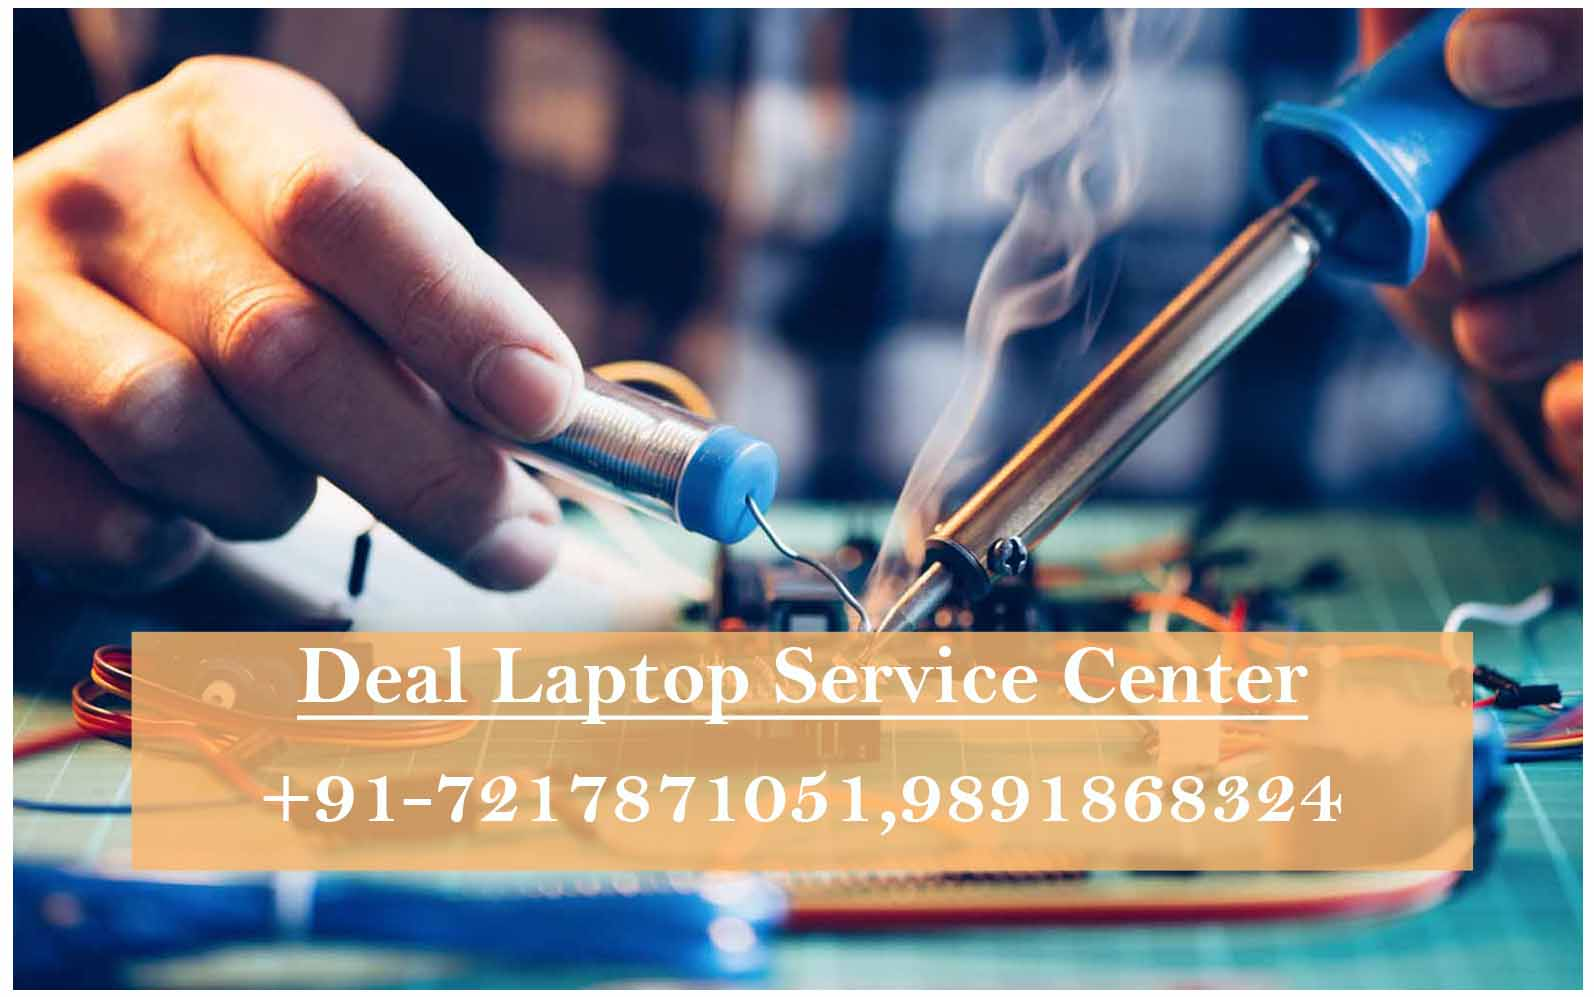 Dell service center in Malad West Mumbai